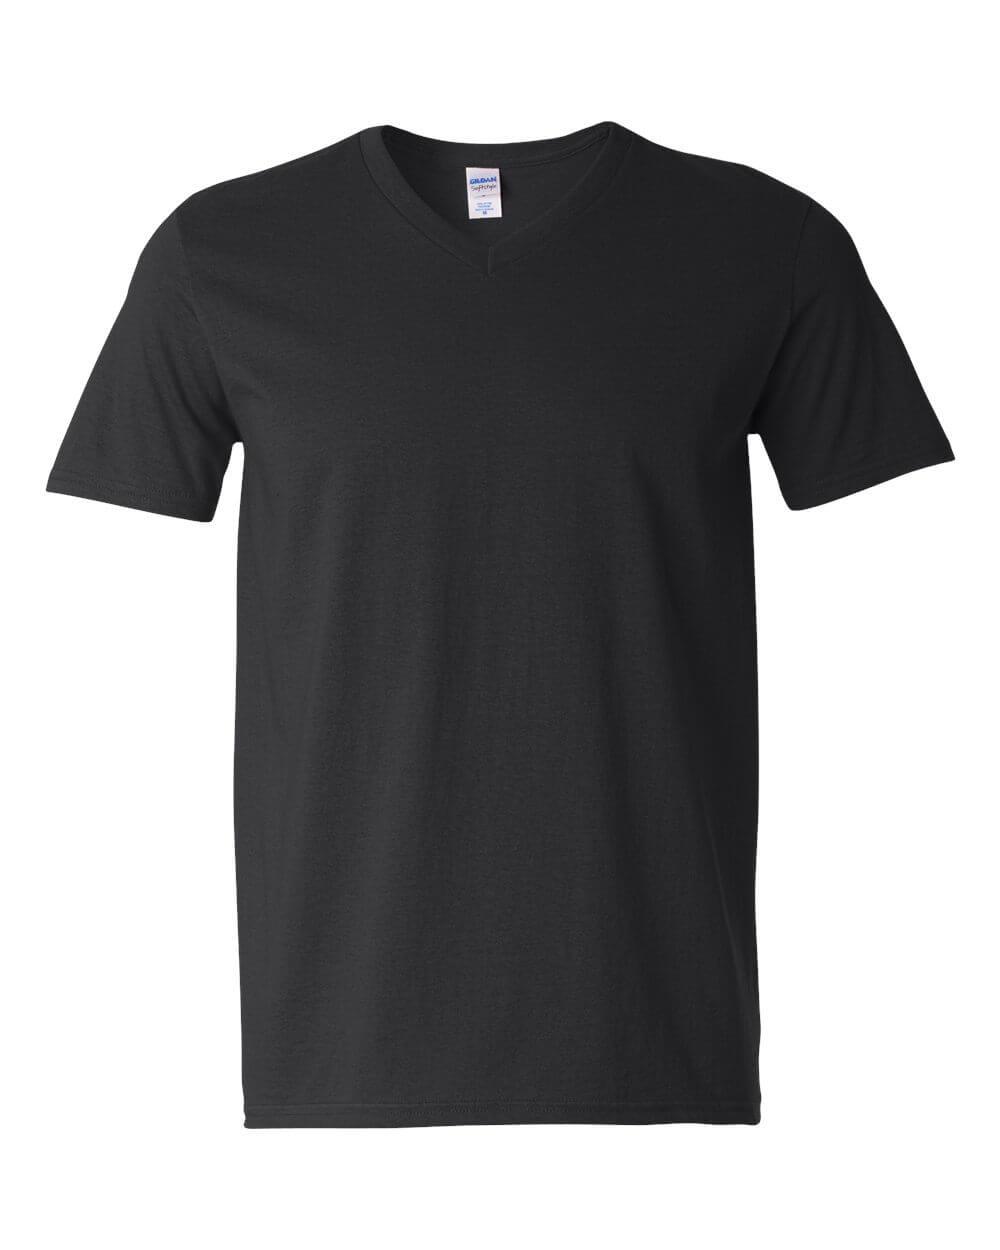 Gildan-Mens-Softstyle-V-Neck-Black-Custom-T-Shirts-1